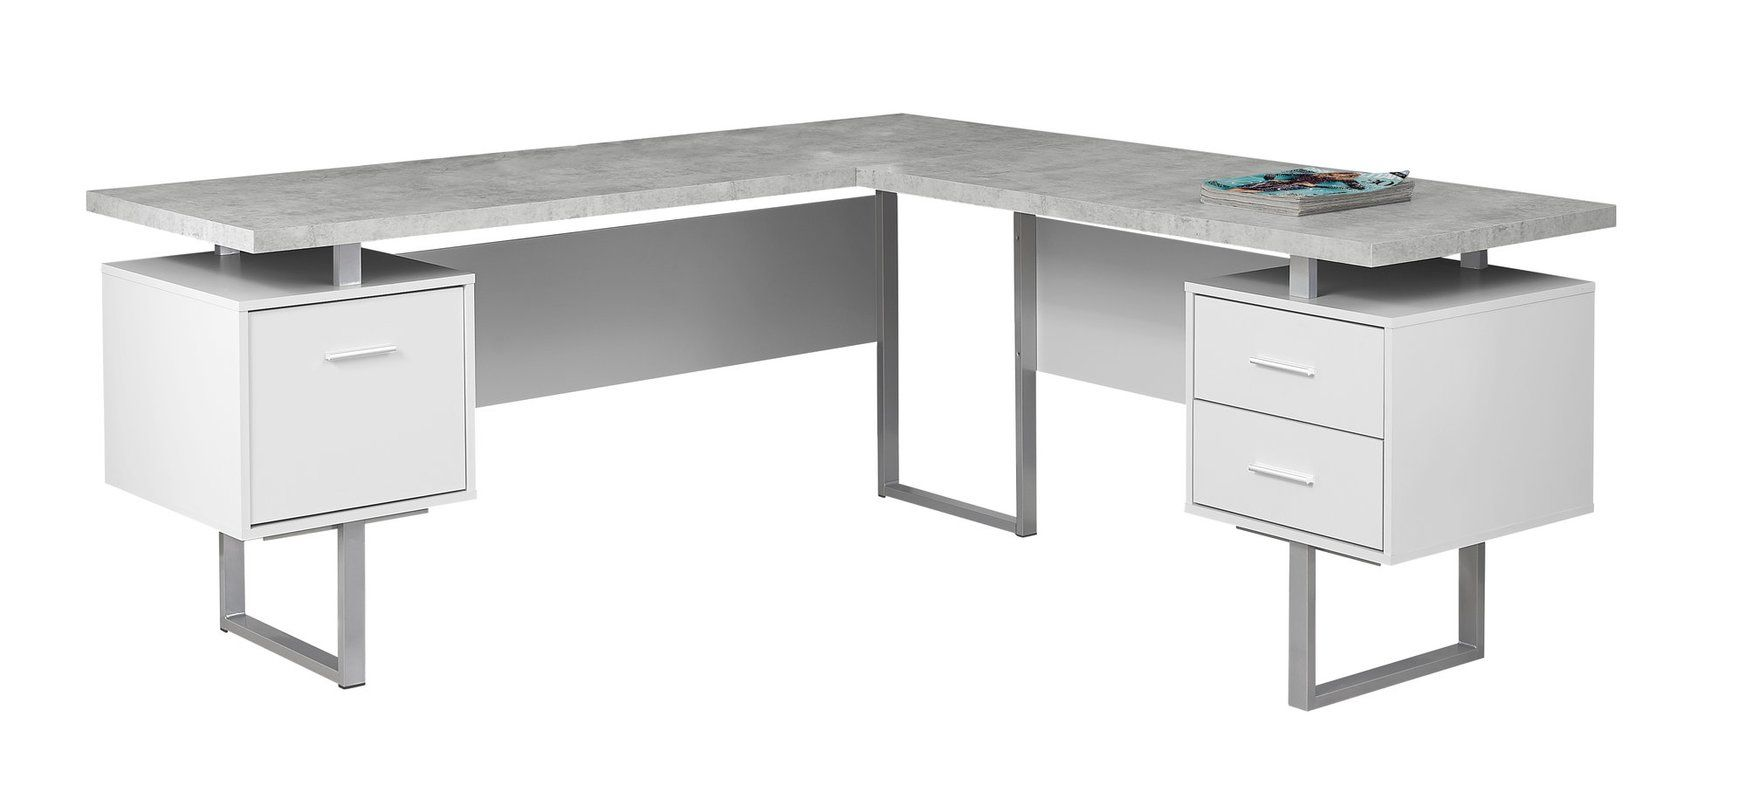 Darroll L Shape Corner Desk L Shaped Corner Desk Office Desk Desk